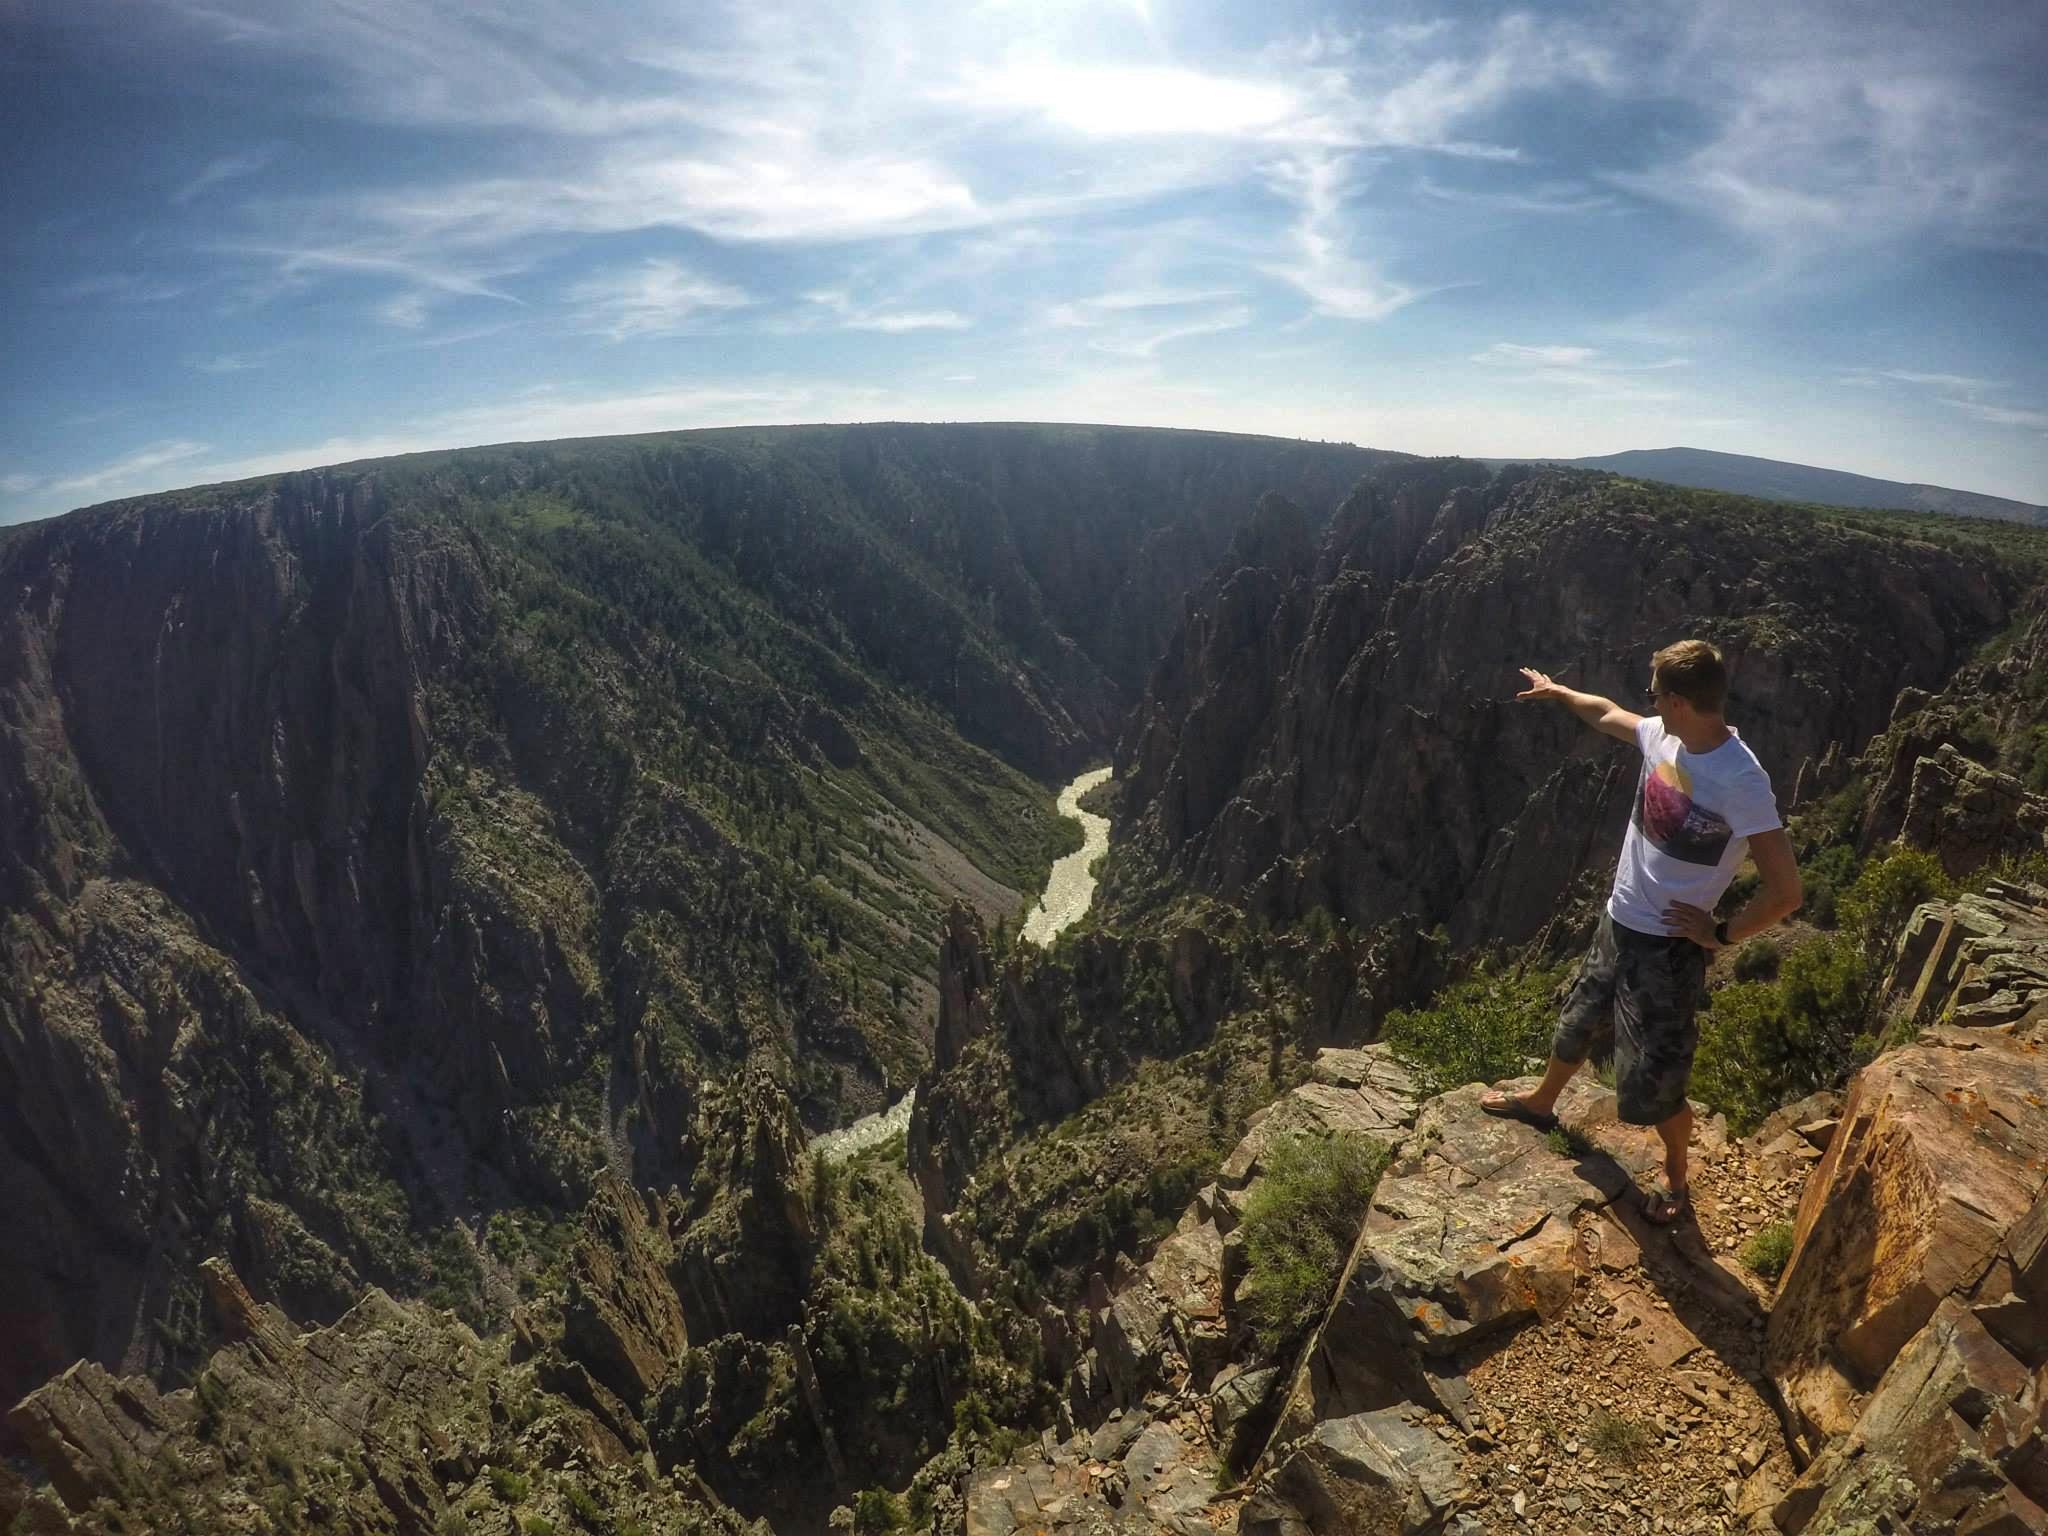 julia pelio black canyon colorado thisworldexists this world exists